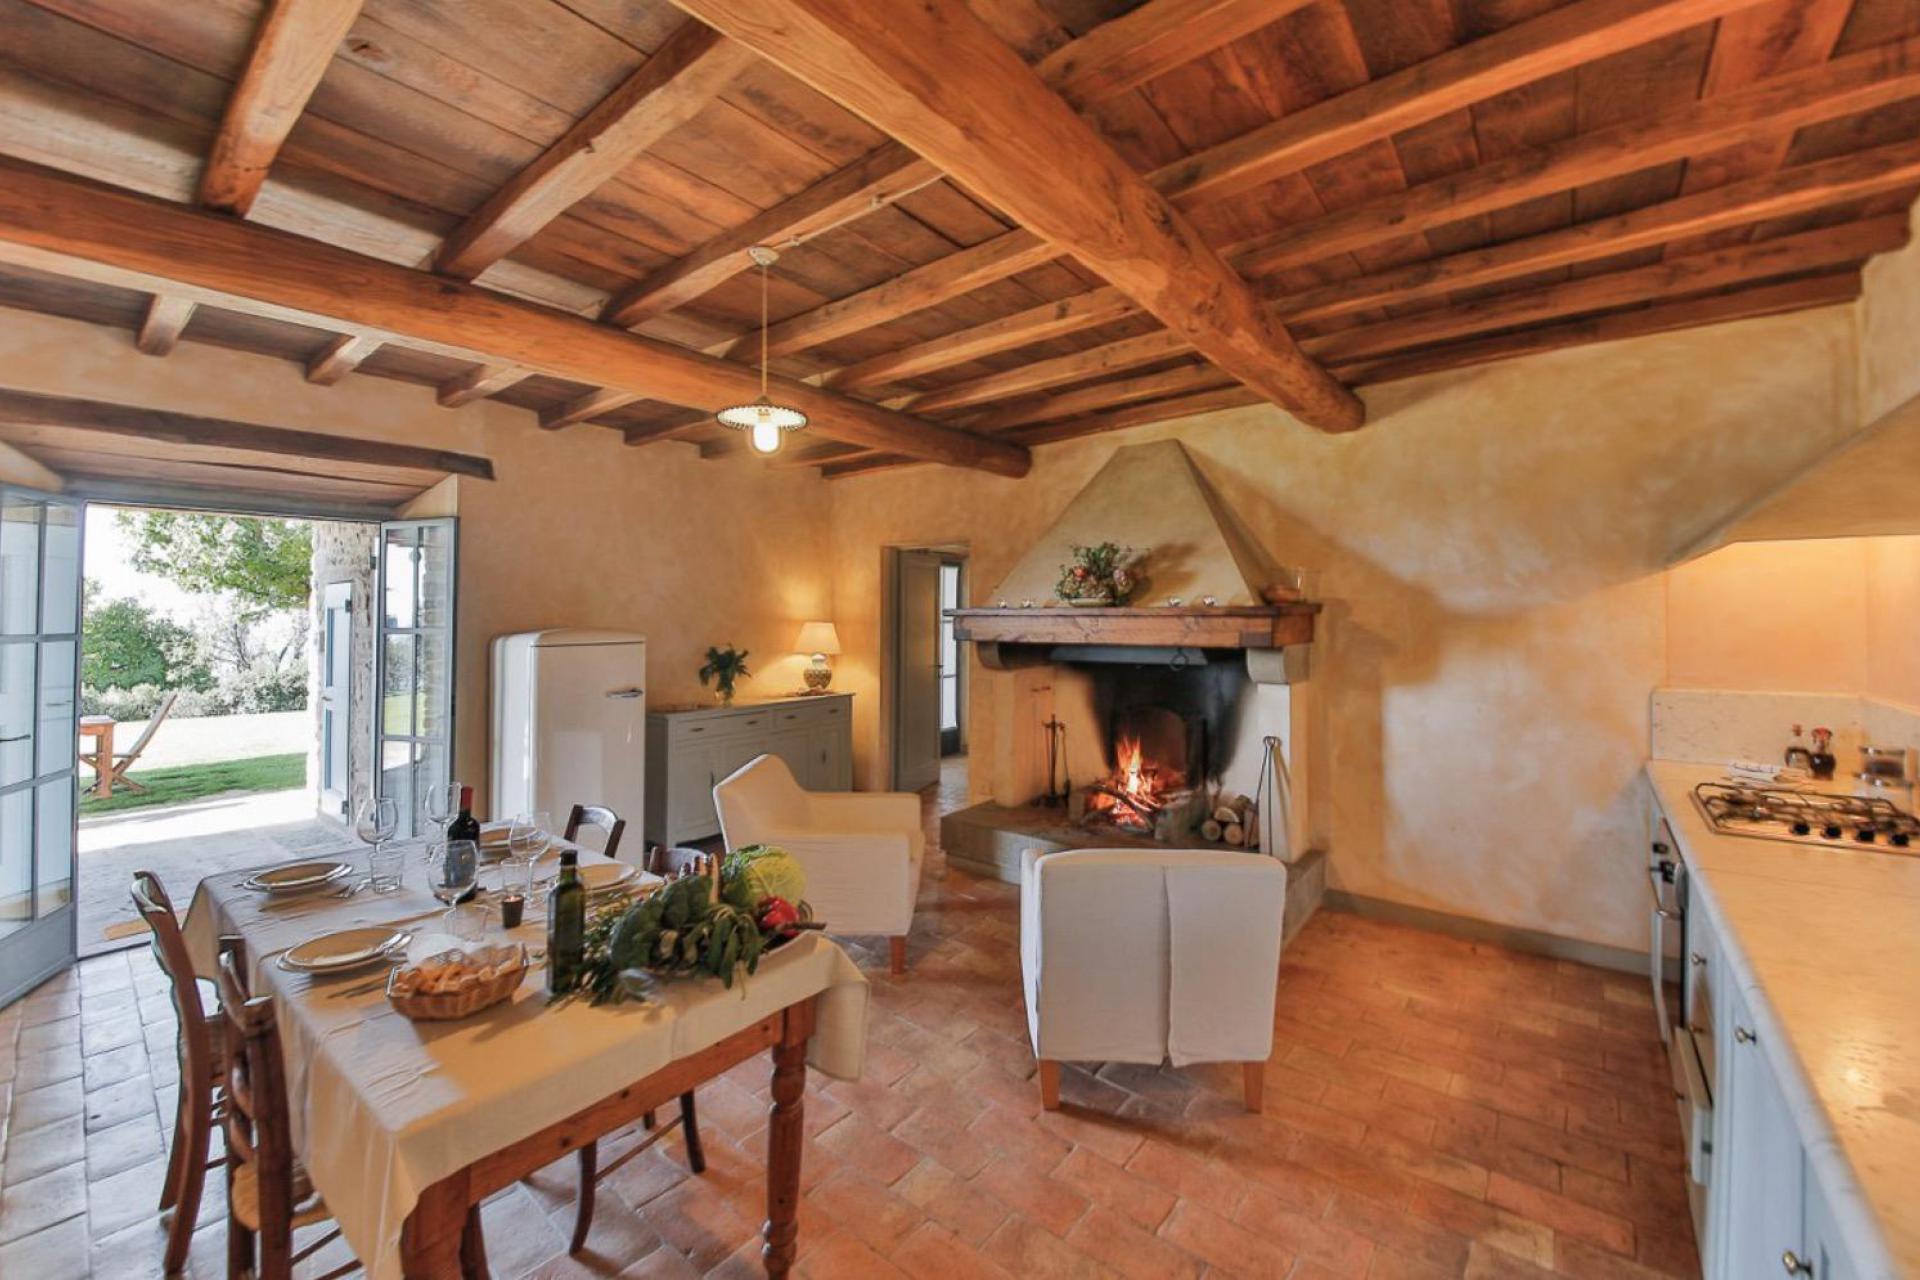 Agriturismo Tuscany Agriturismo Tuscany, luxury apartments and great views